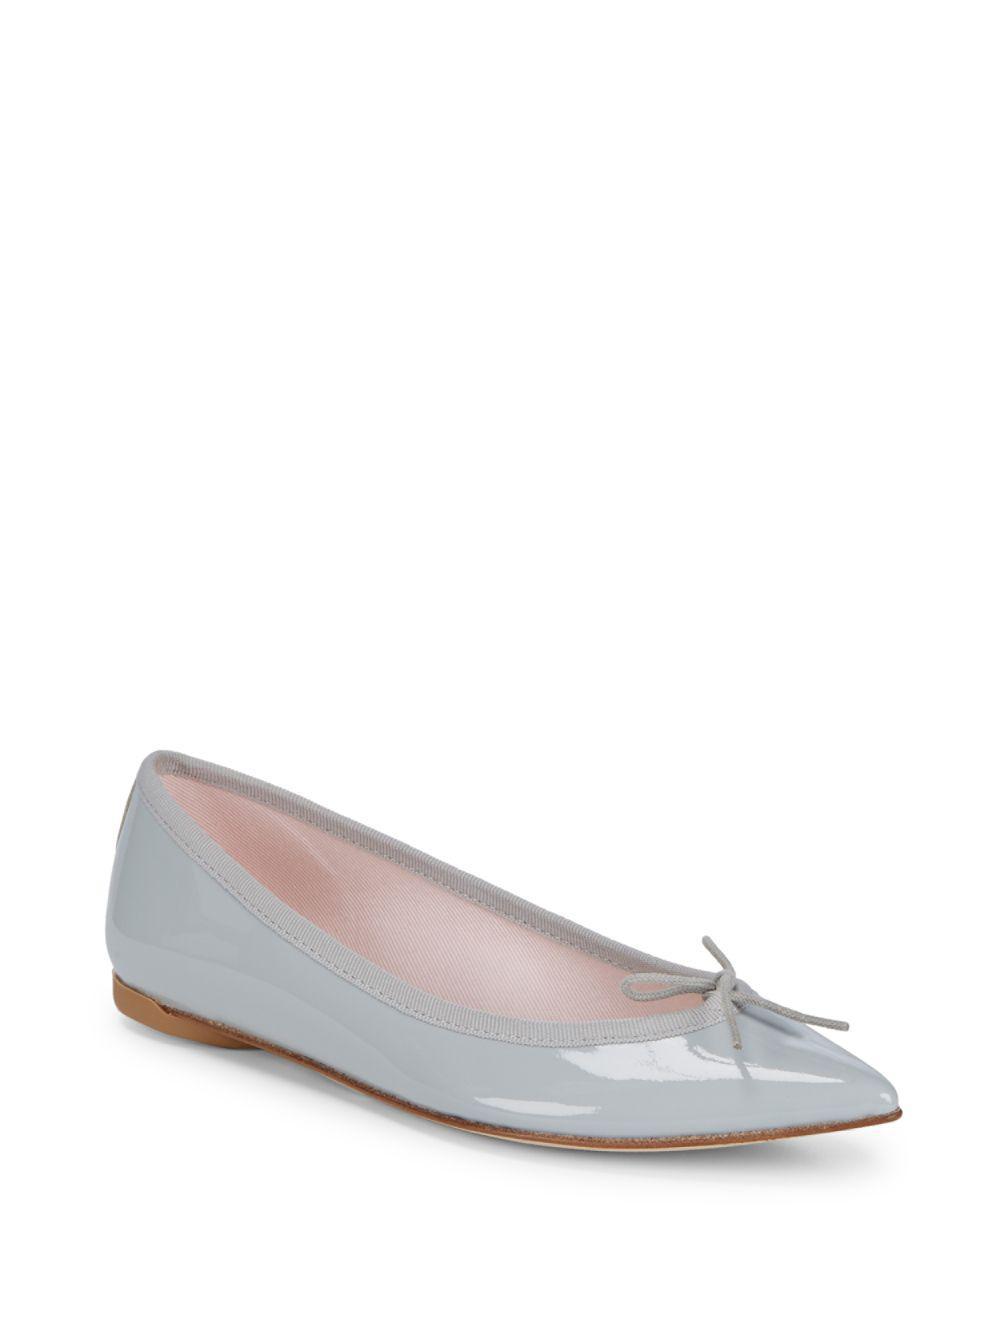 Repetto Pink Patent Brigitte Ballerina Flats iAHPEipI